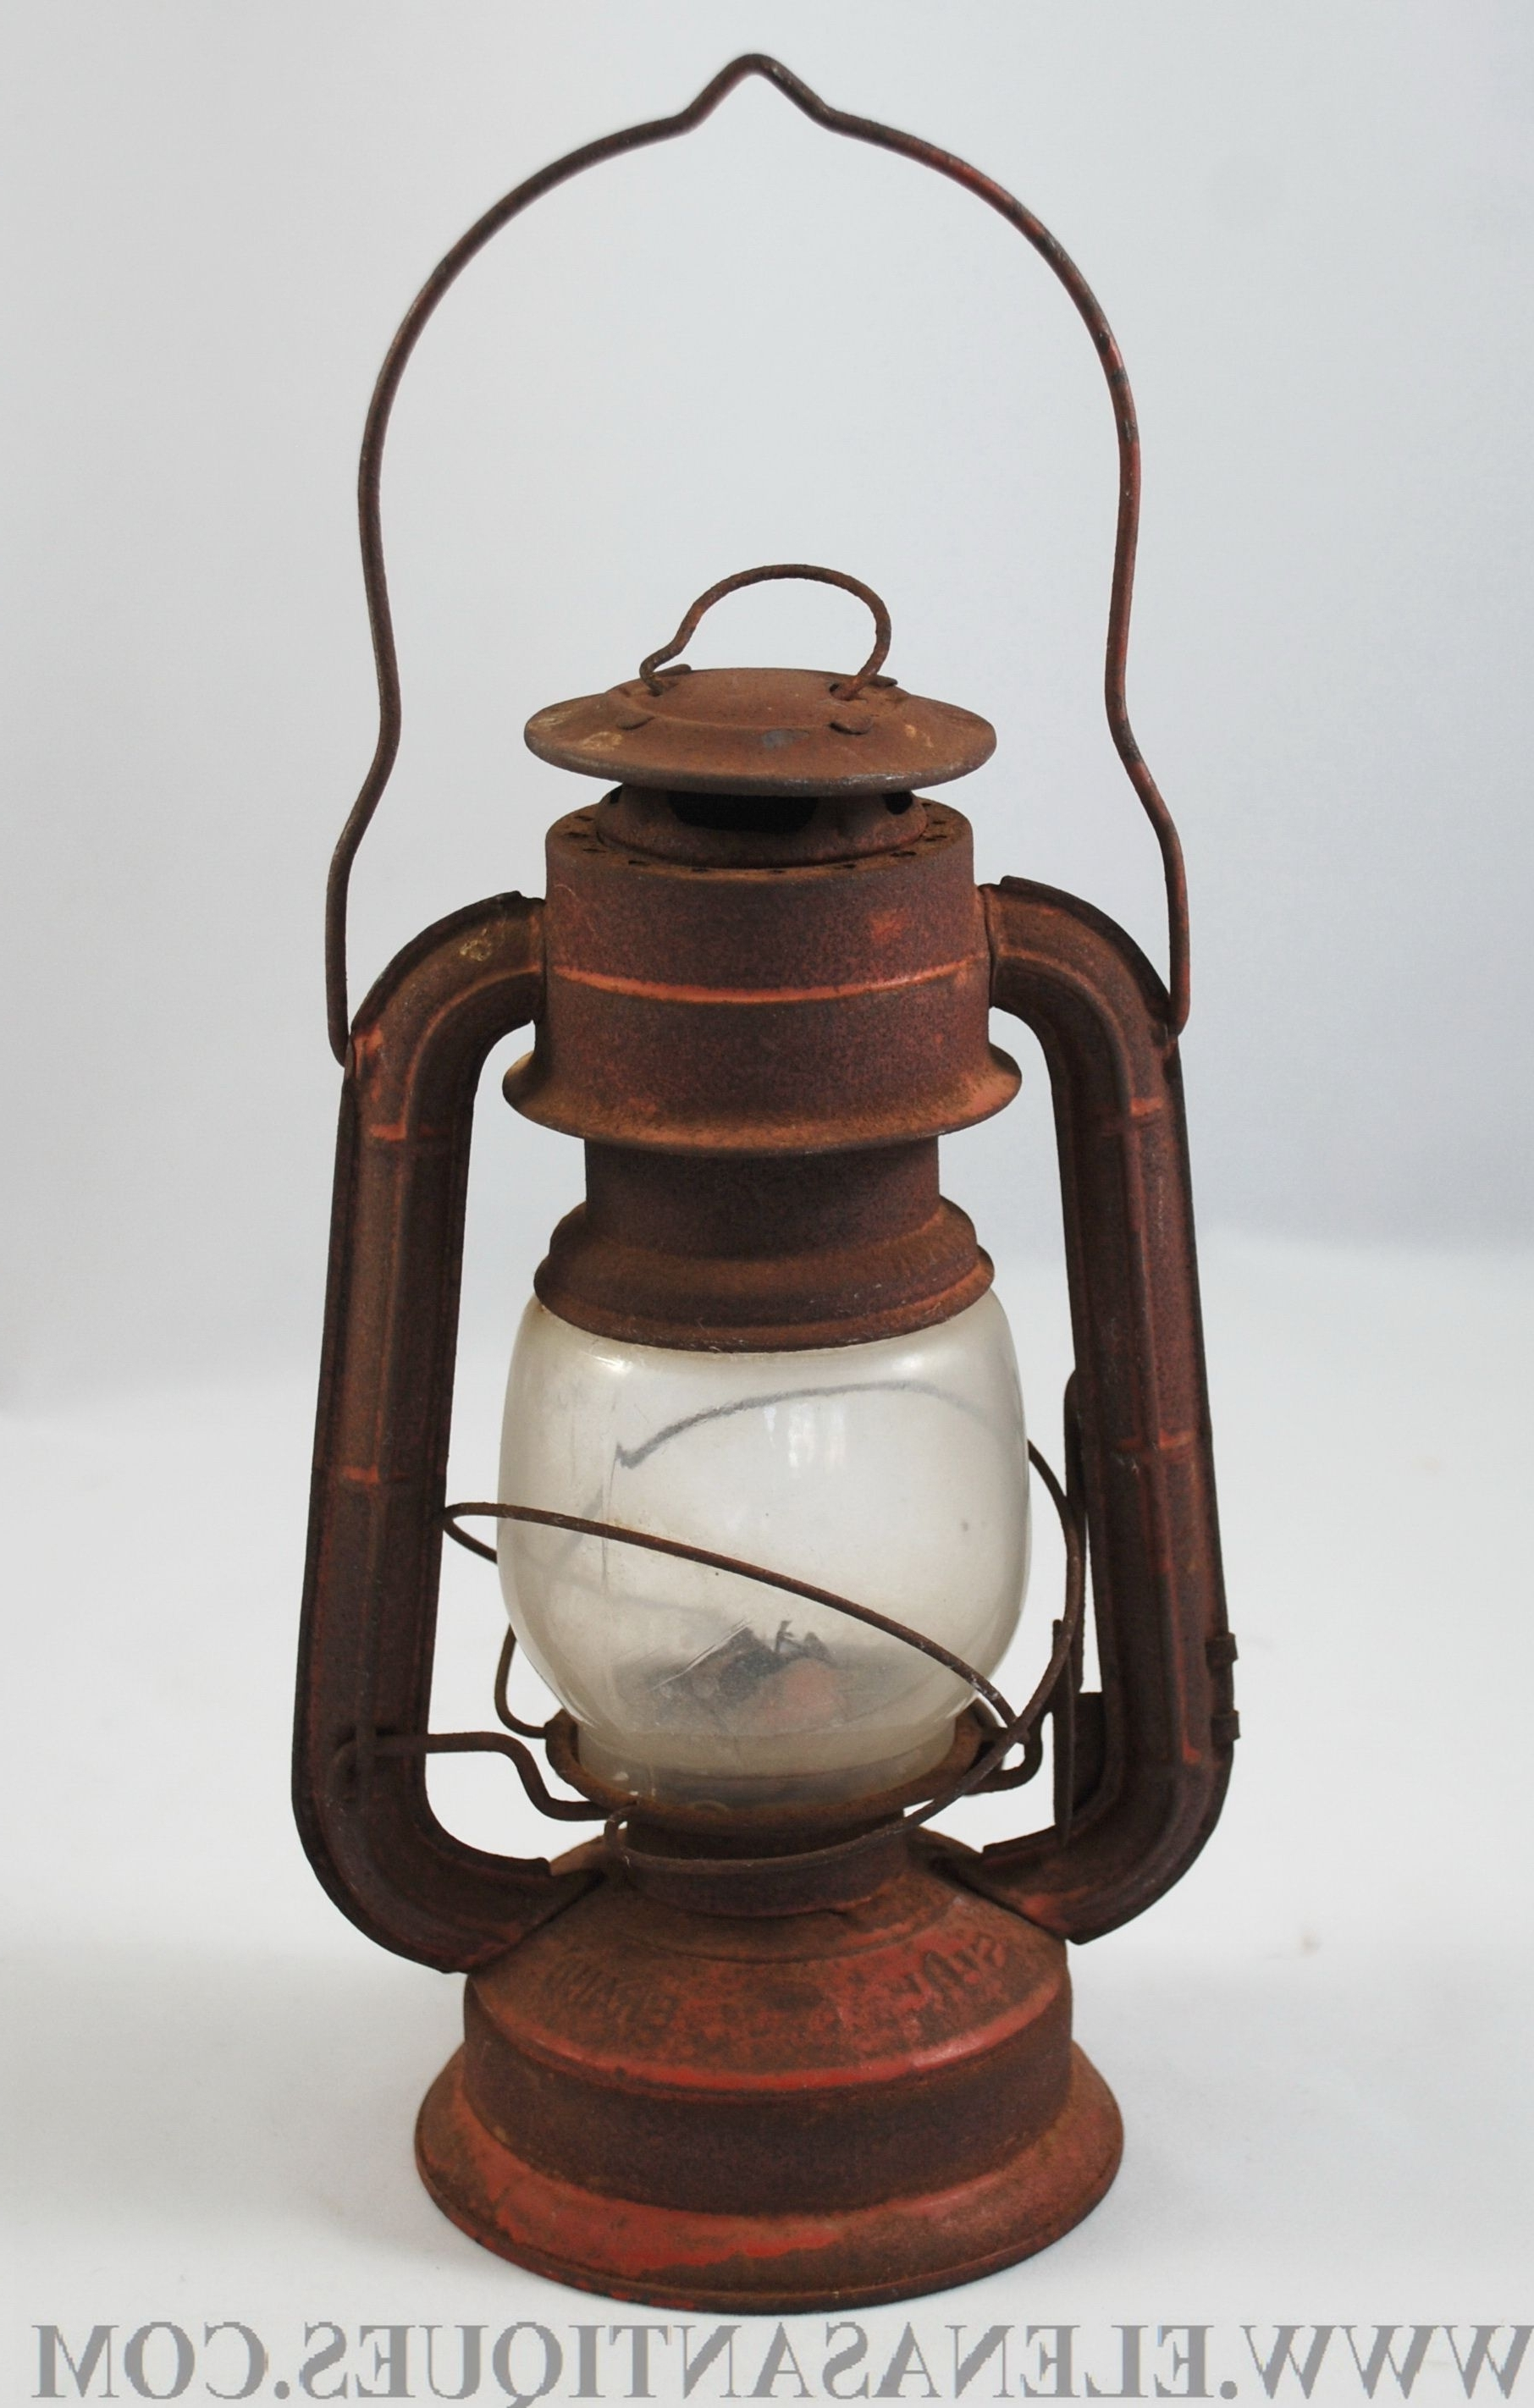 Light Of Lanterns Within Most Recent Outdoor Kerosene Lanterns (View 3 of 20)